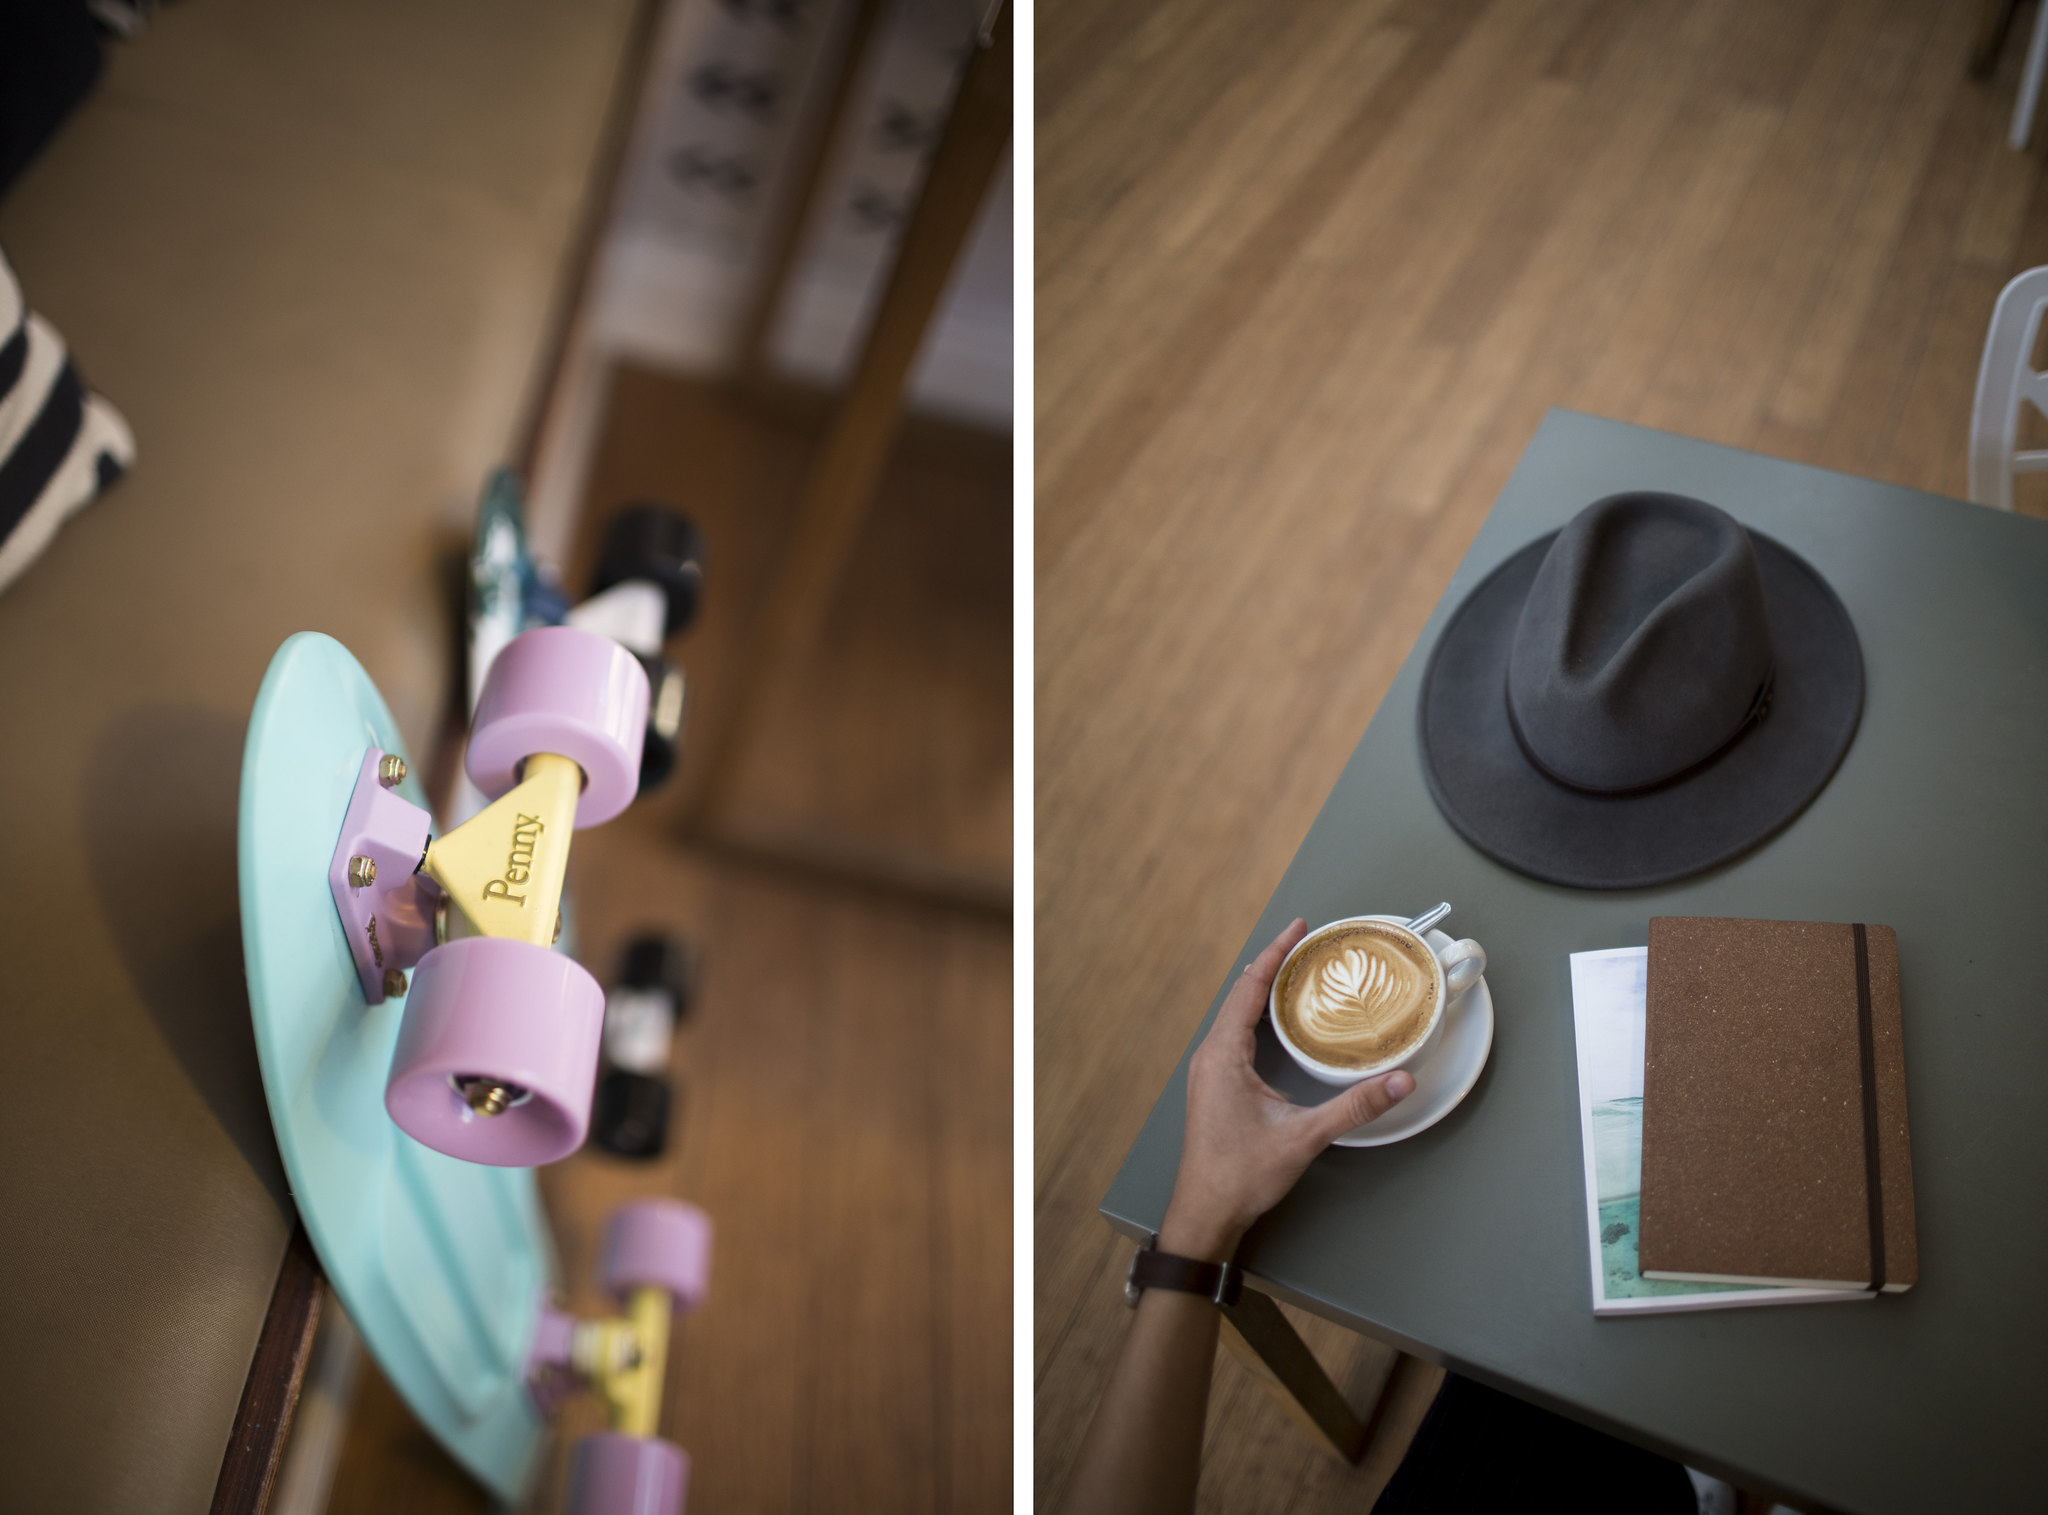 Jordan_Bunker_penny_skateboards_5